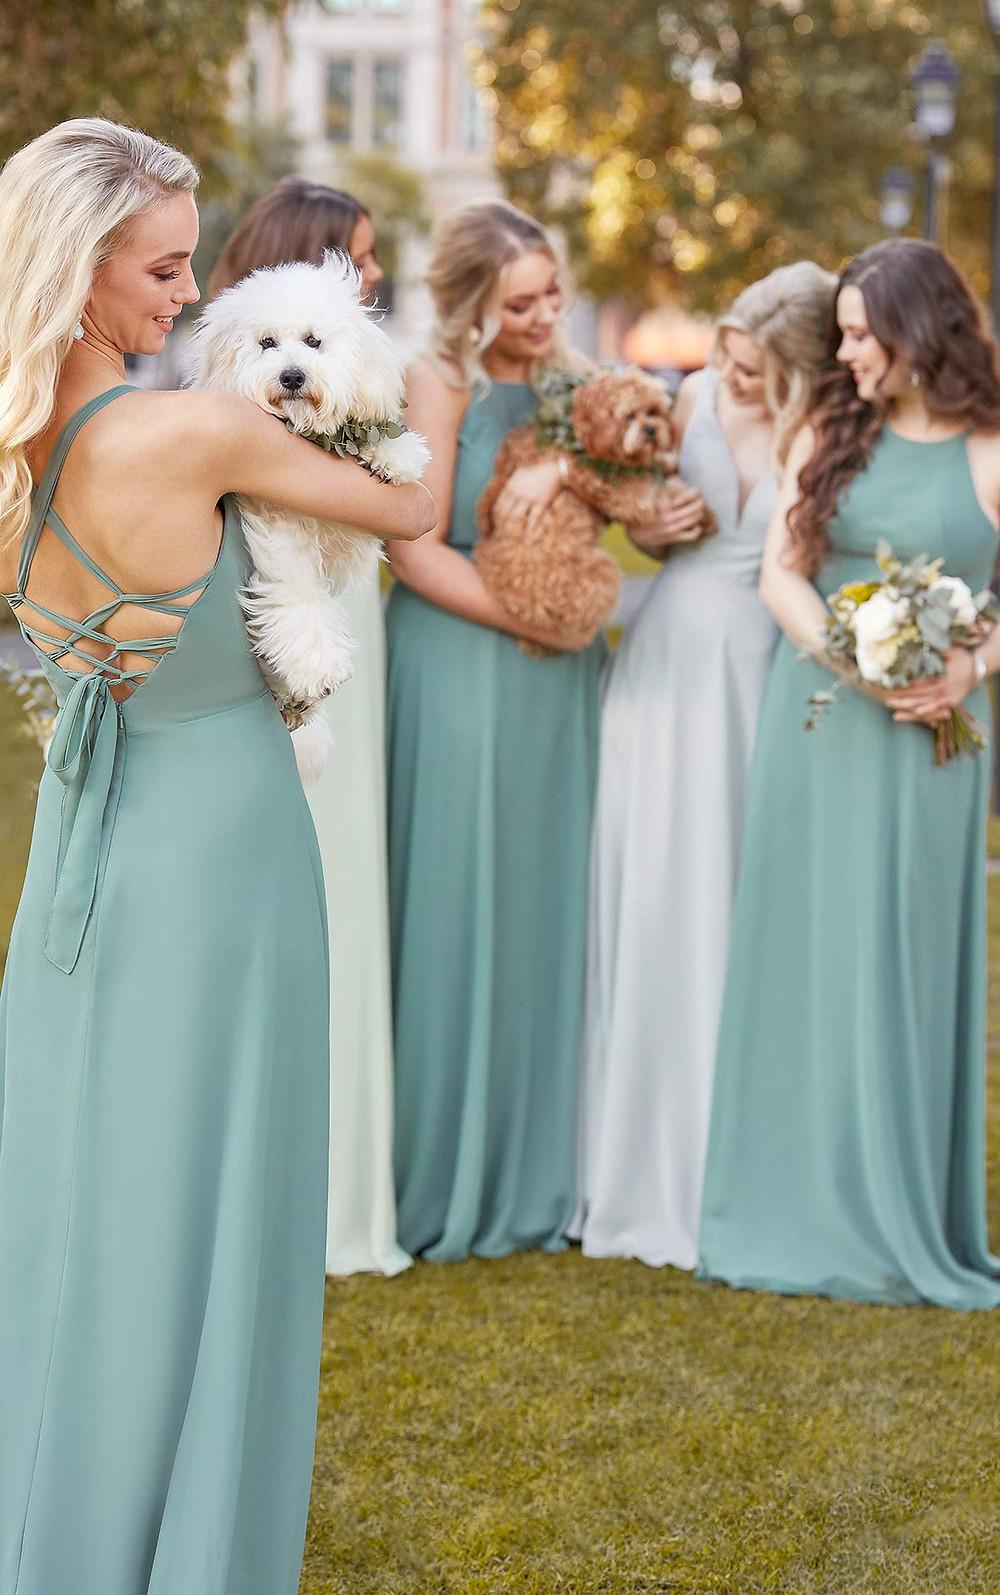 Green Bridesmaid Dresses Sheffield